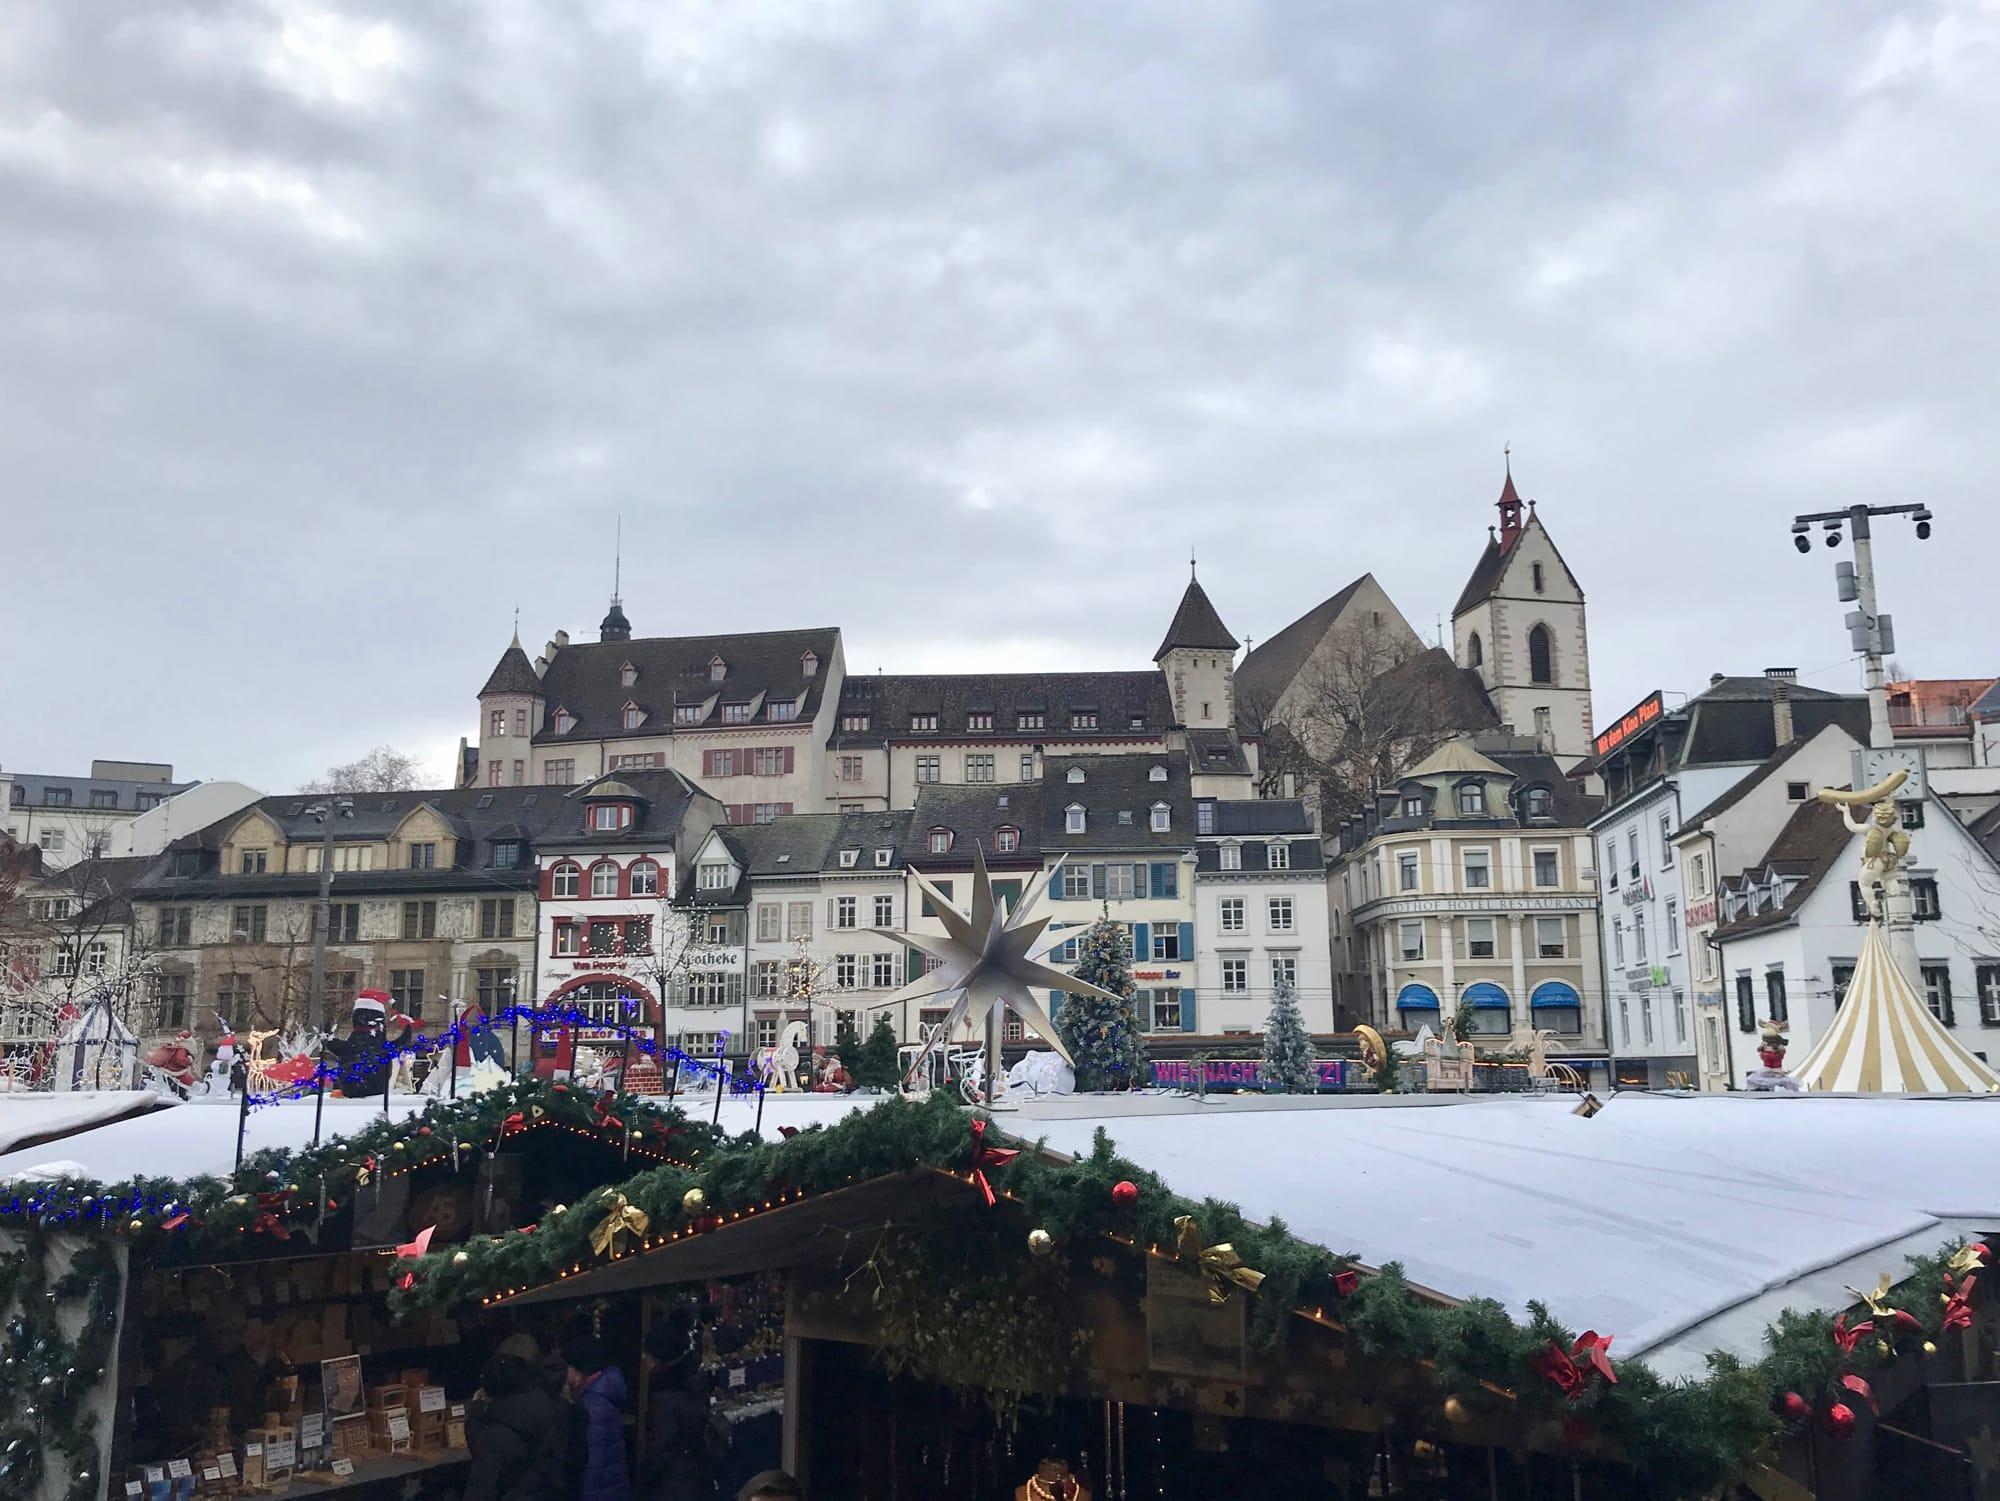 Il mercatino di Natale di Basilea in Barfüsserplatz